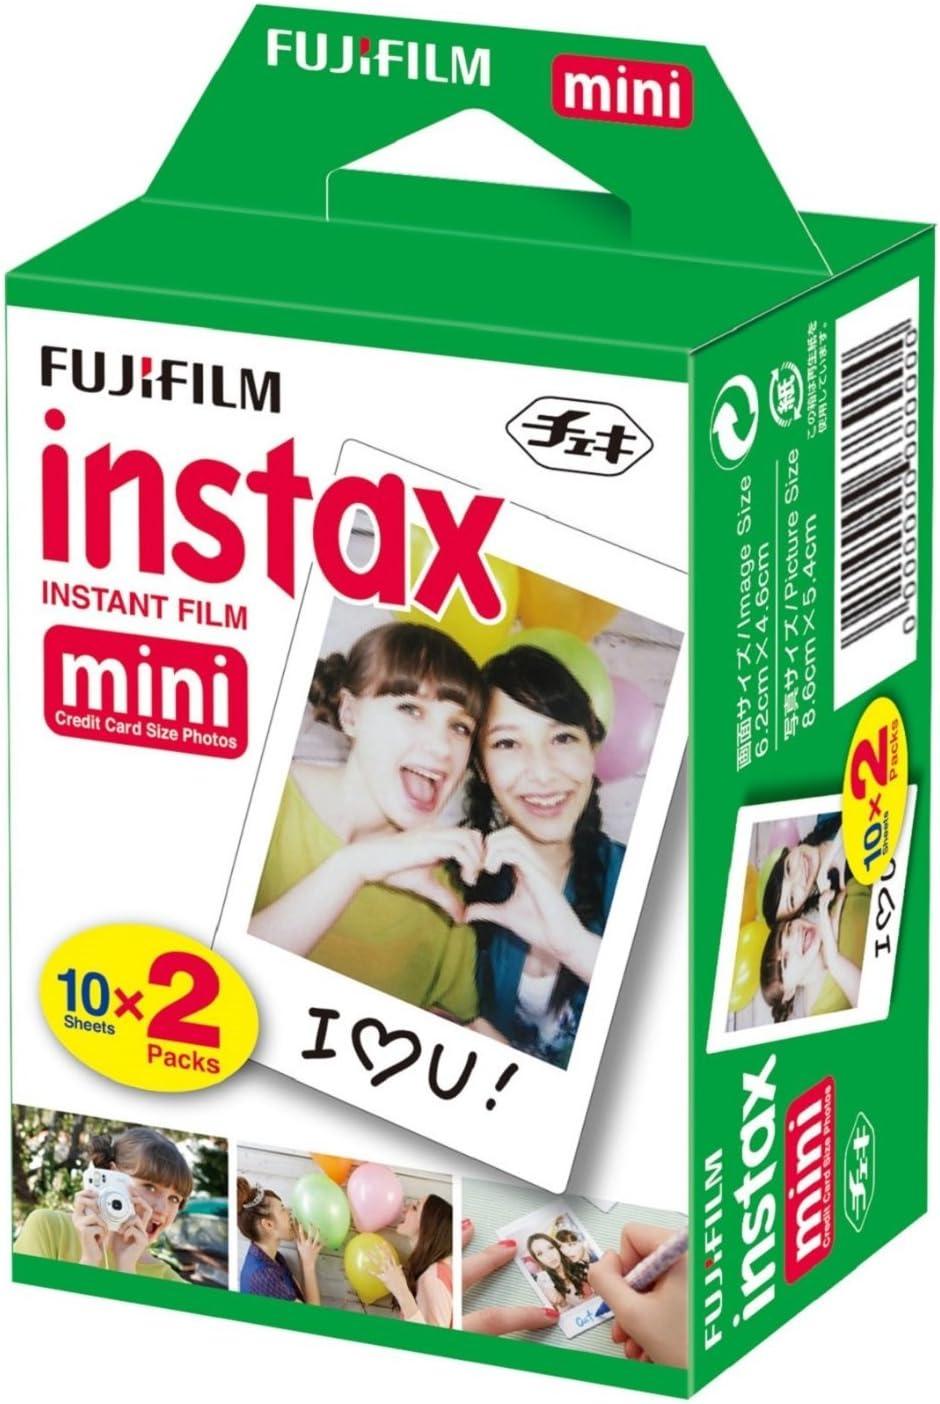 Fujifilm Instax Mini Film 20 Prints for Fuji 8 50s 25 7s 90 300, Full Color